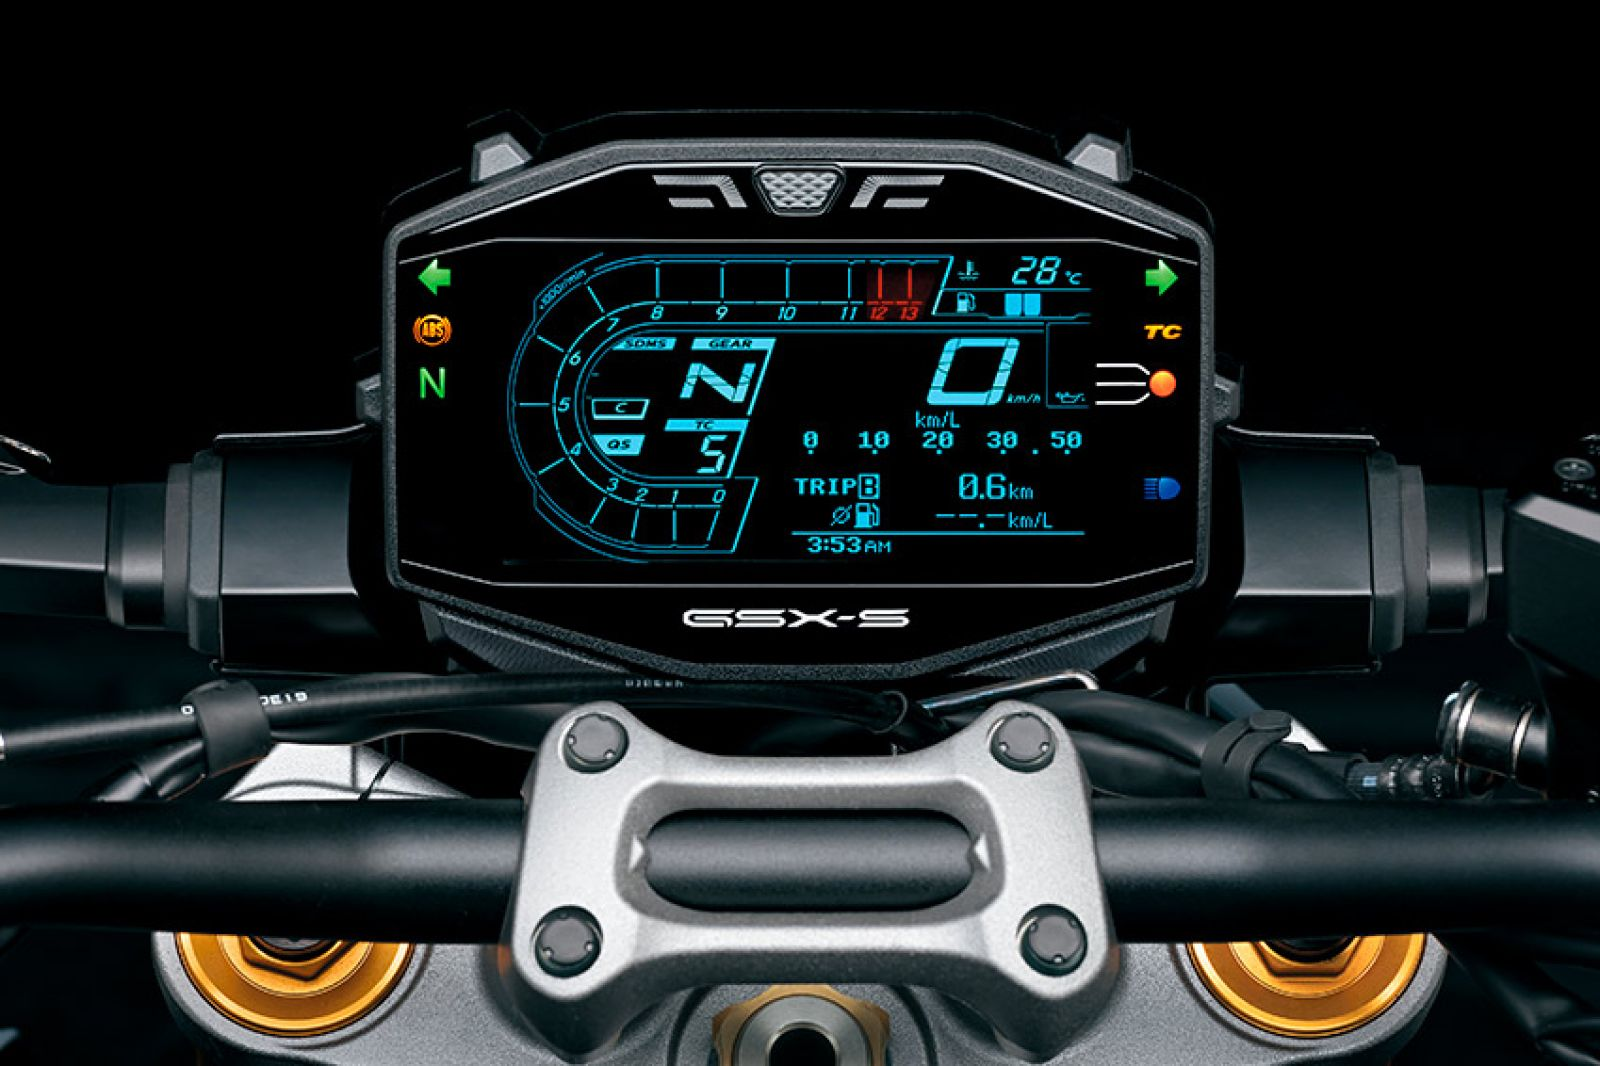 SUZUKI - GSX-S 1000 MOD 2021 EURO 5 - image d'illustration 5